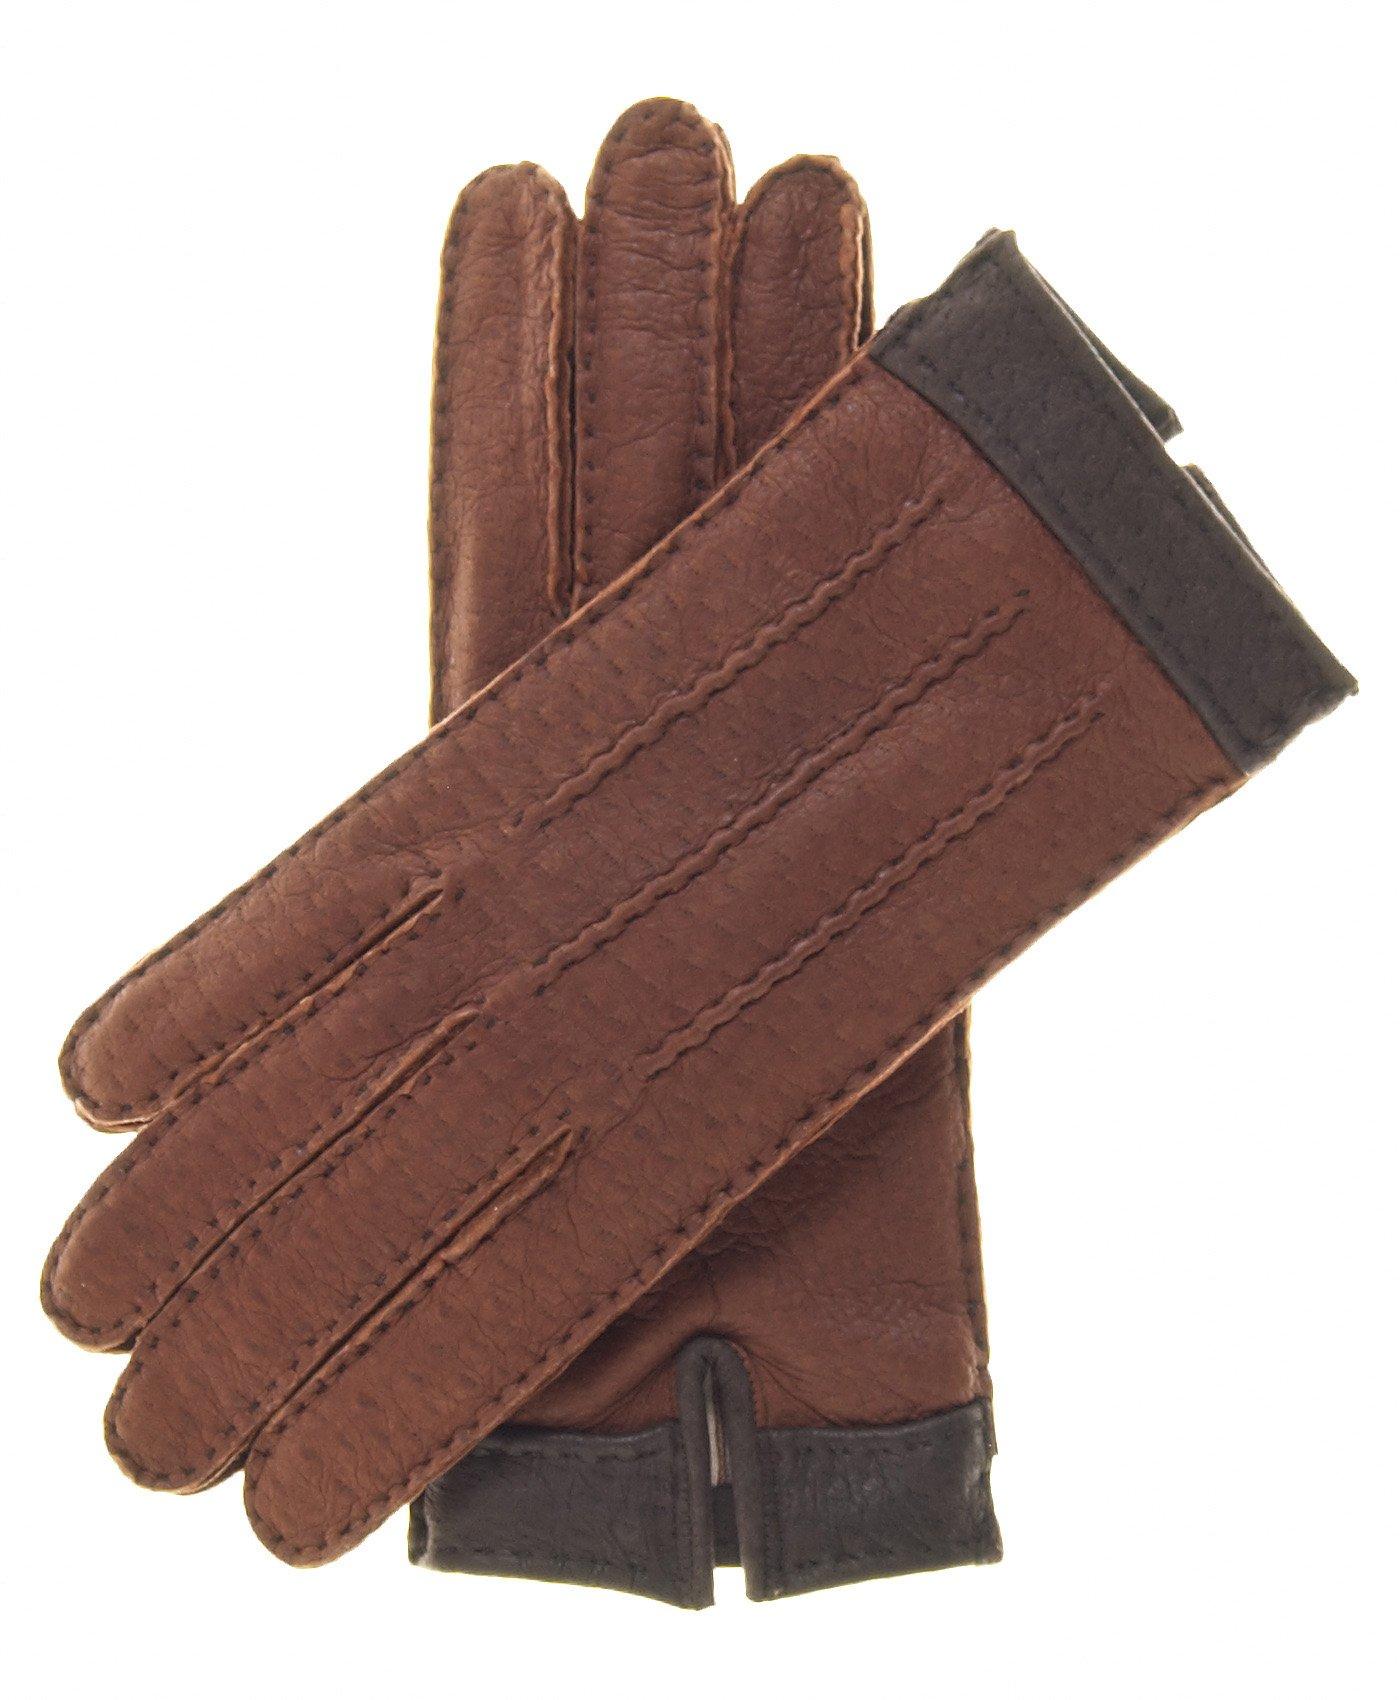 Fratelli Orsini Women's Italian Cashmere Lined Peccary Gloves Size 7 1/2 Color Cork by Fratelli Orsini (Image #3)